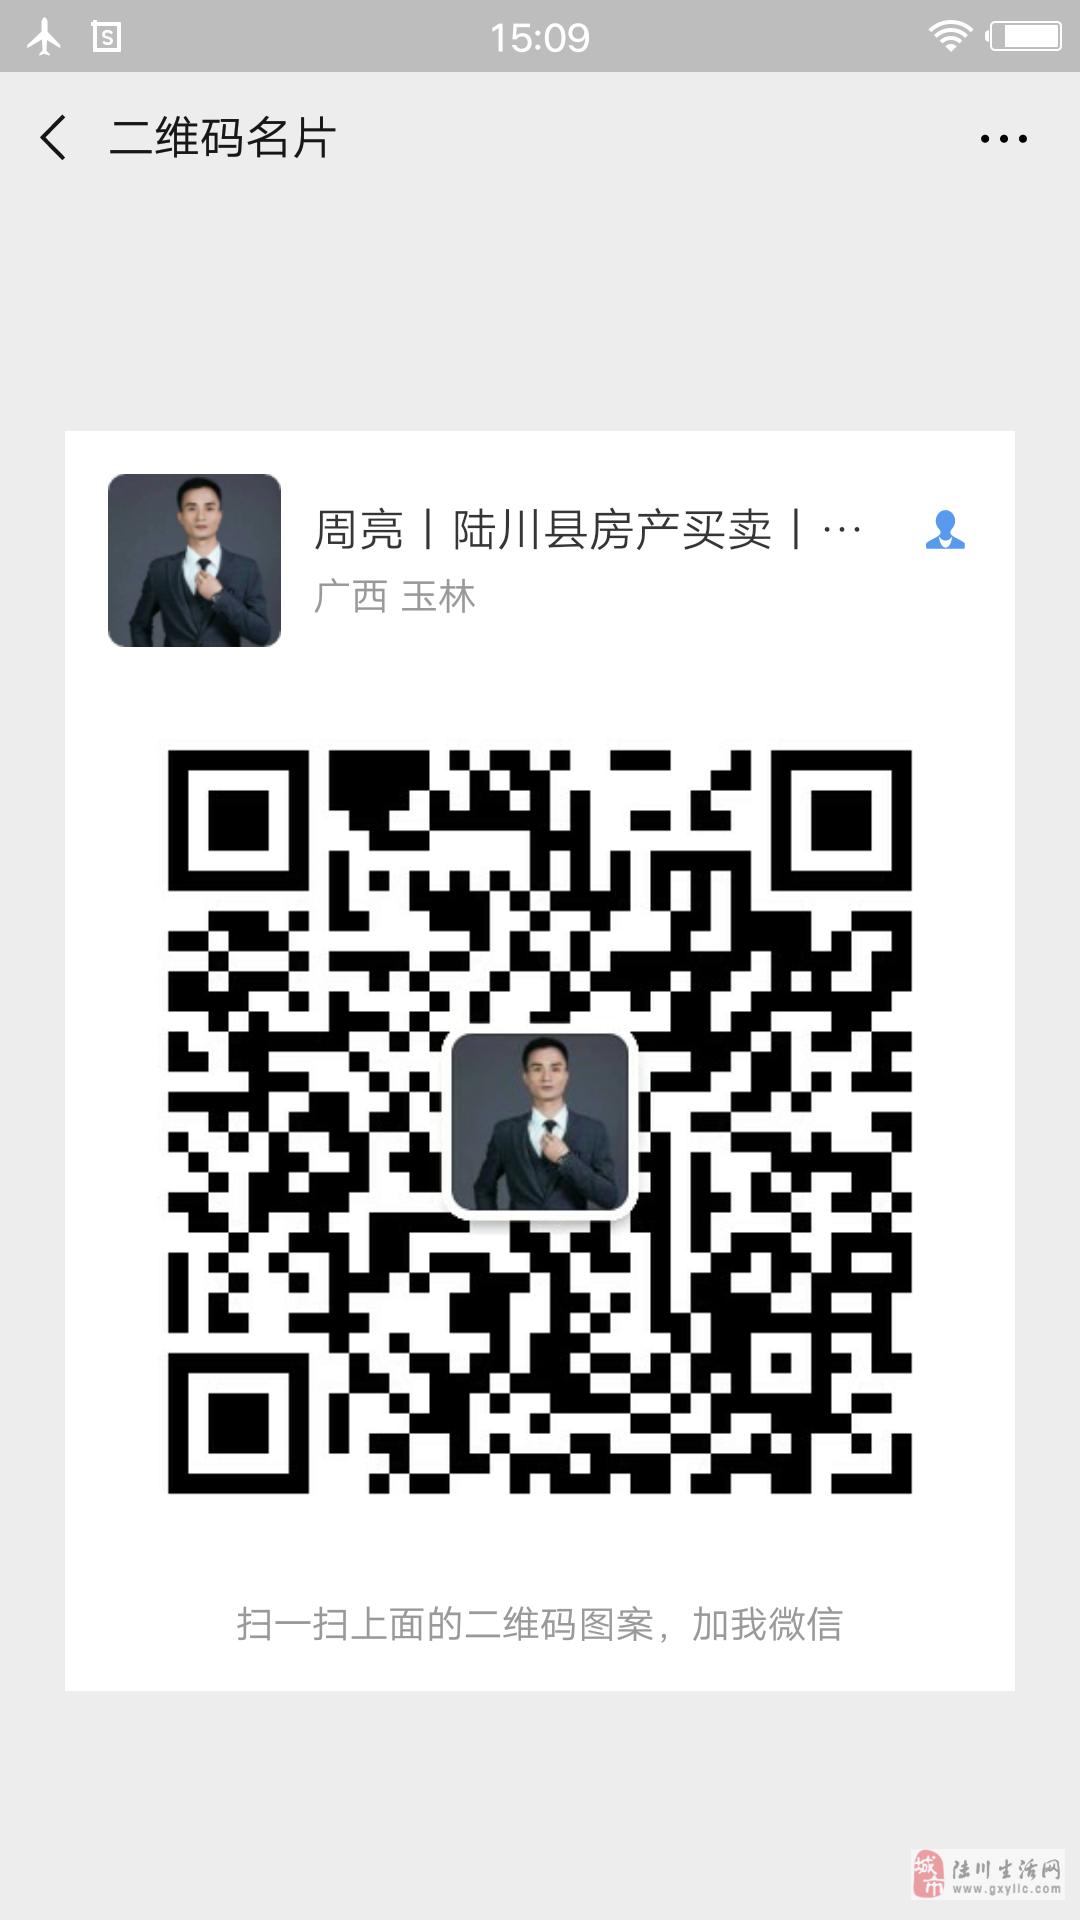 2020qq红包免费领取碧桂城5室2厅2卫65万元抄底价出售